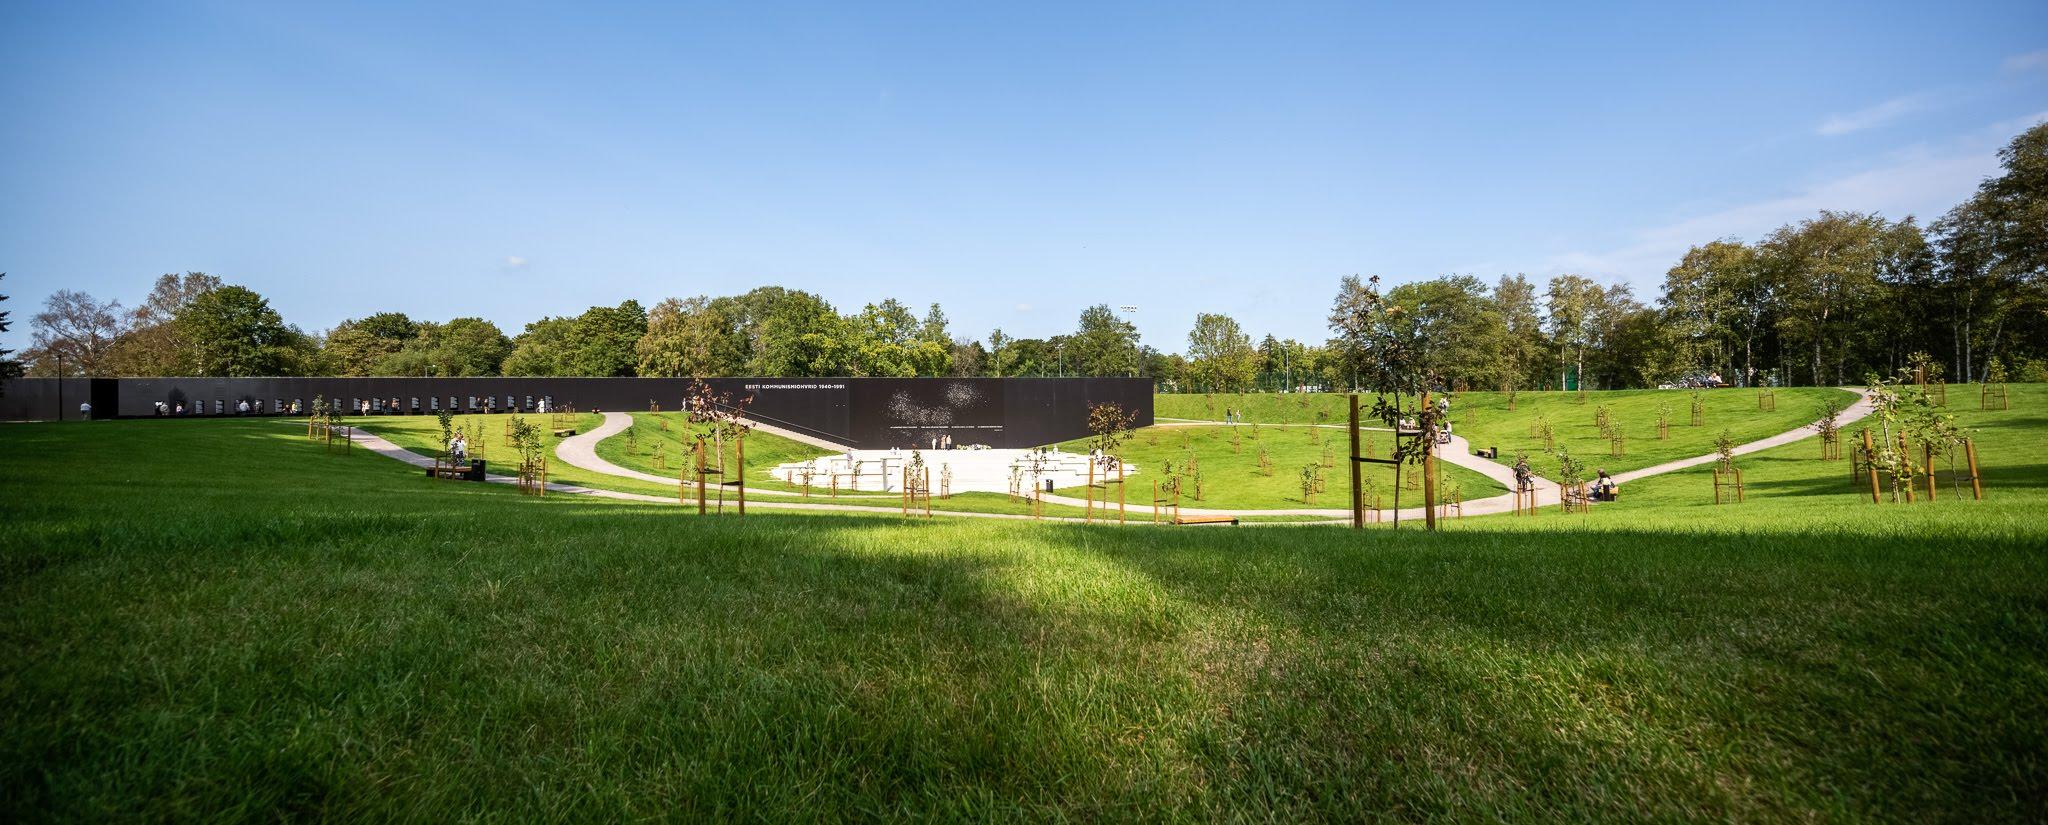 Memoriaali arhitektuuriauhind (foto Maris Tomba)